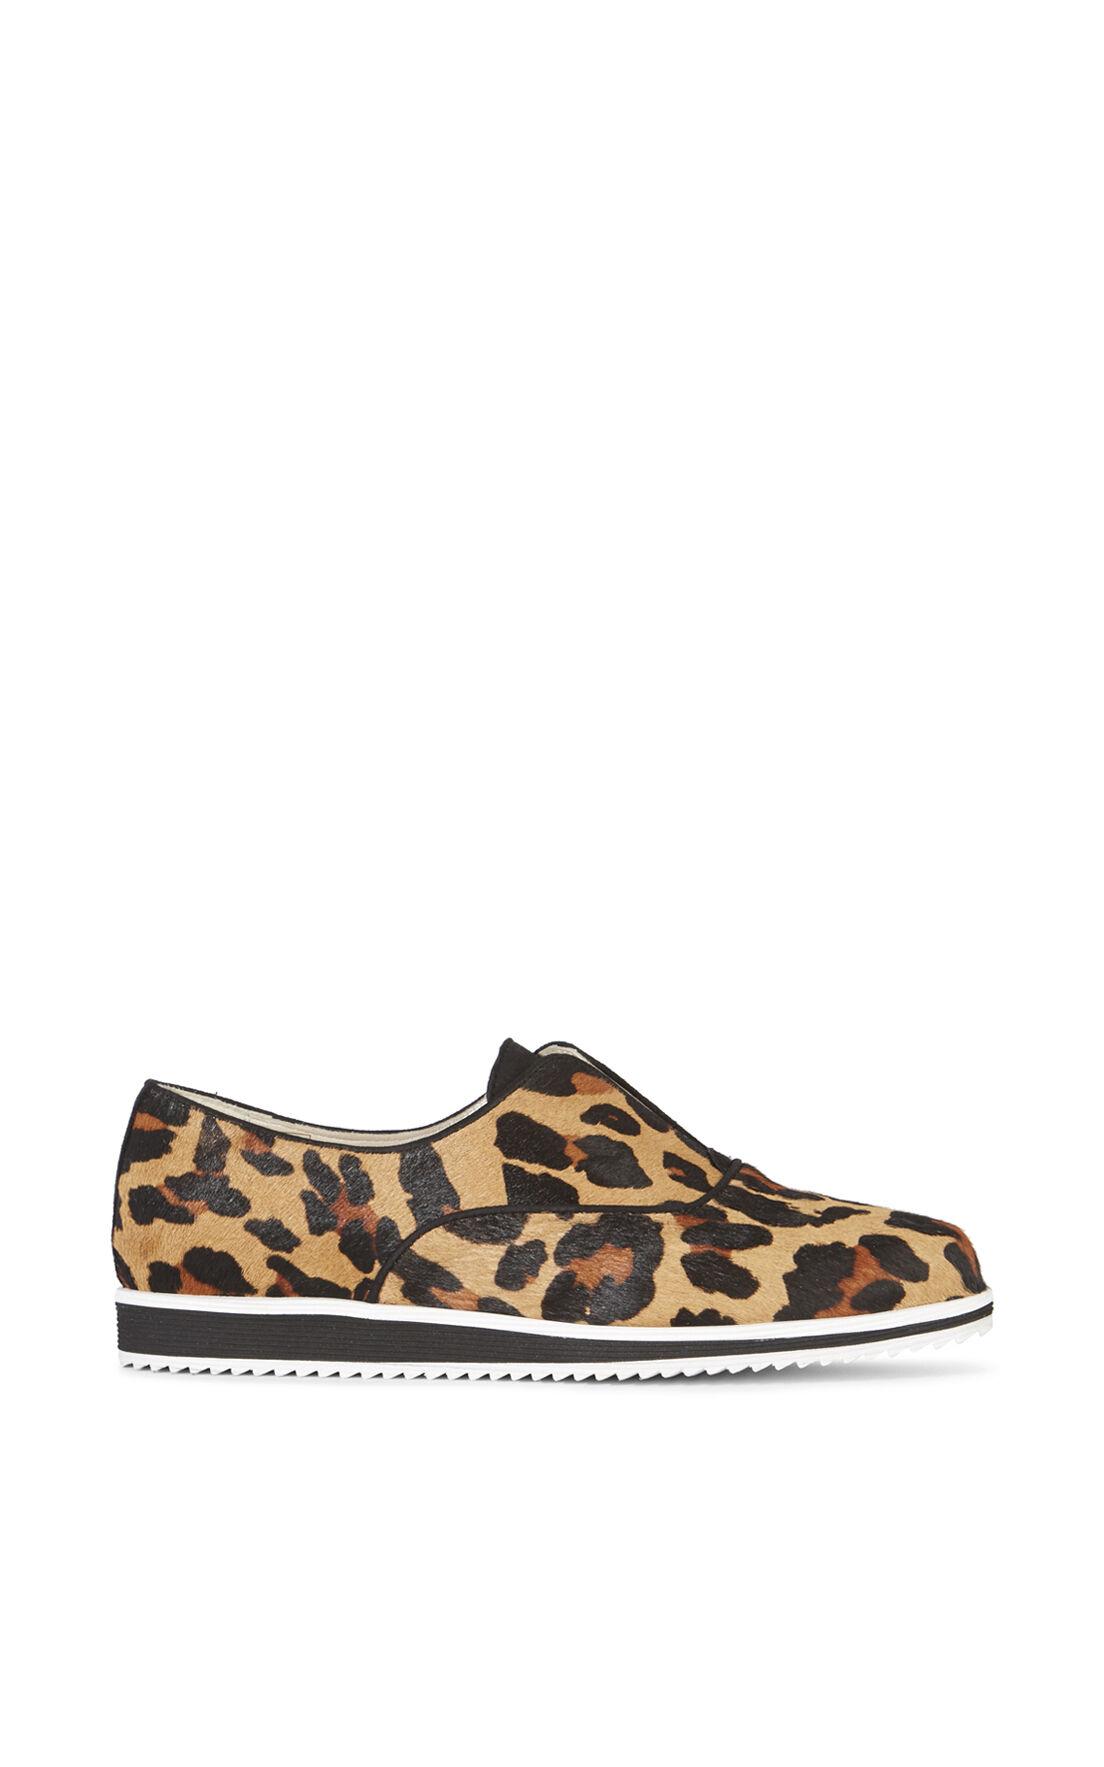 Karen Millen, LEOPARD SLIP ON TRAINER Leopard Print 0